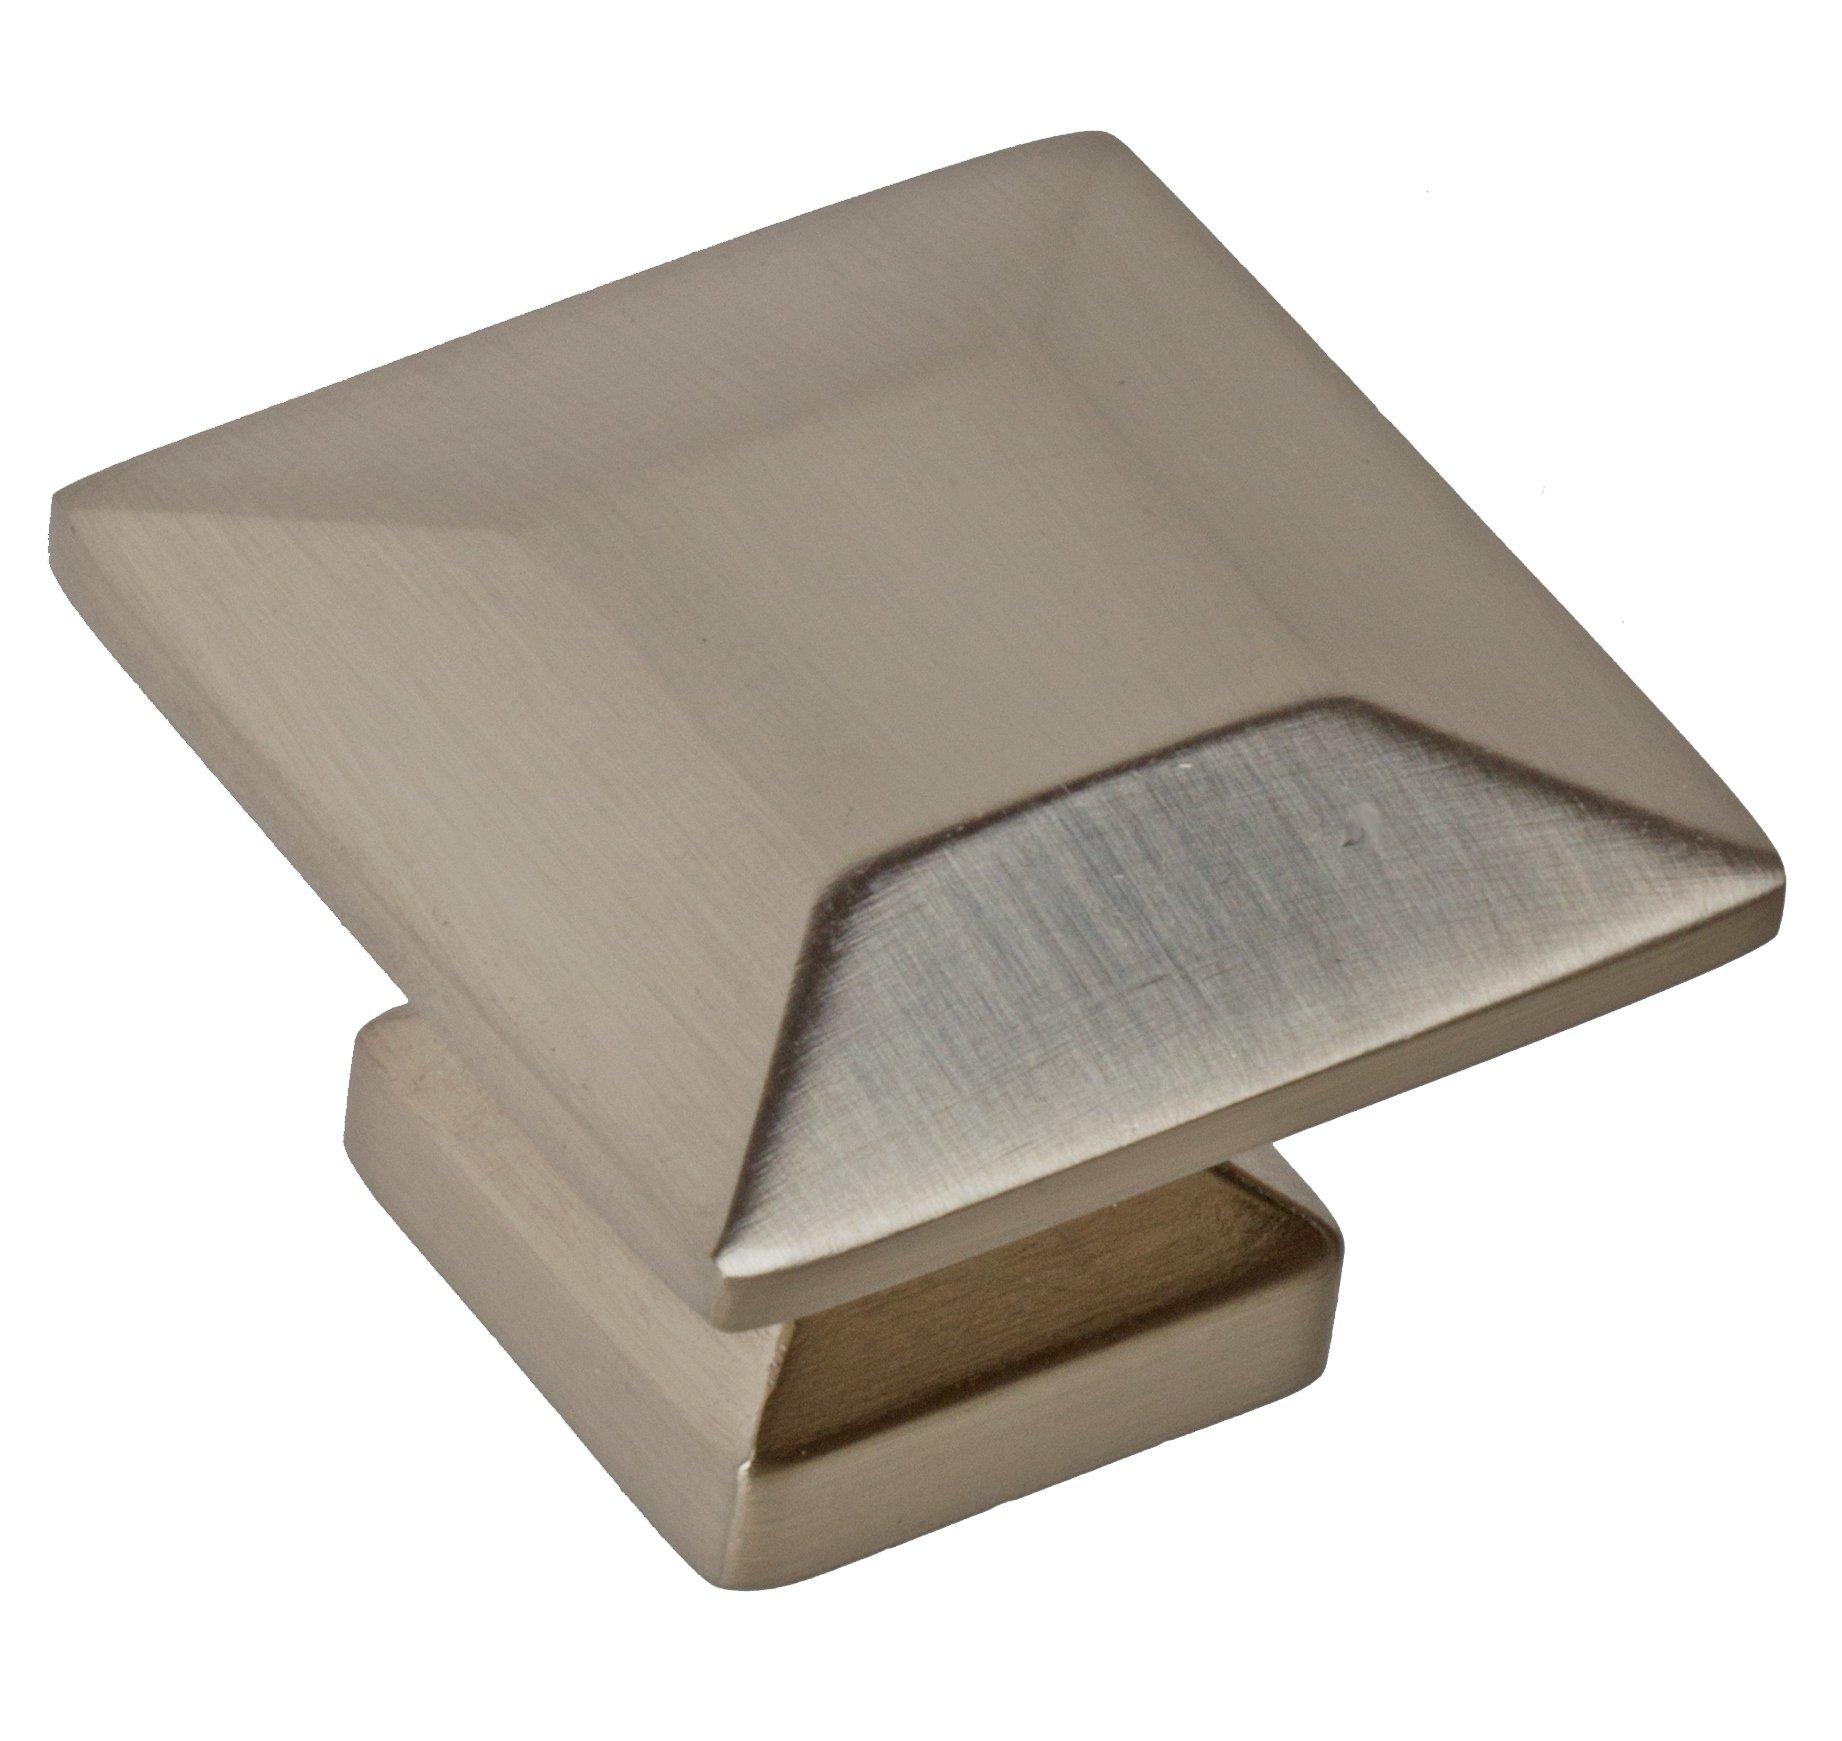 GlideRite Hardware 5101-SN-100 1.375 inch Satin Nickel Square Cabinet Knobs 100 Pack